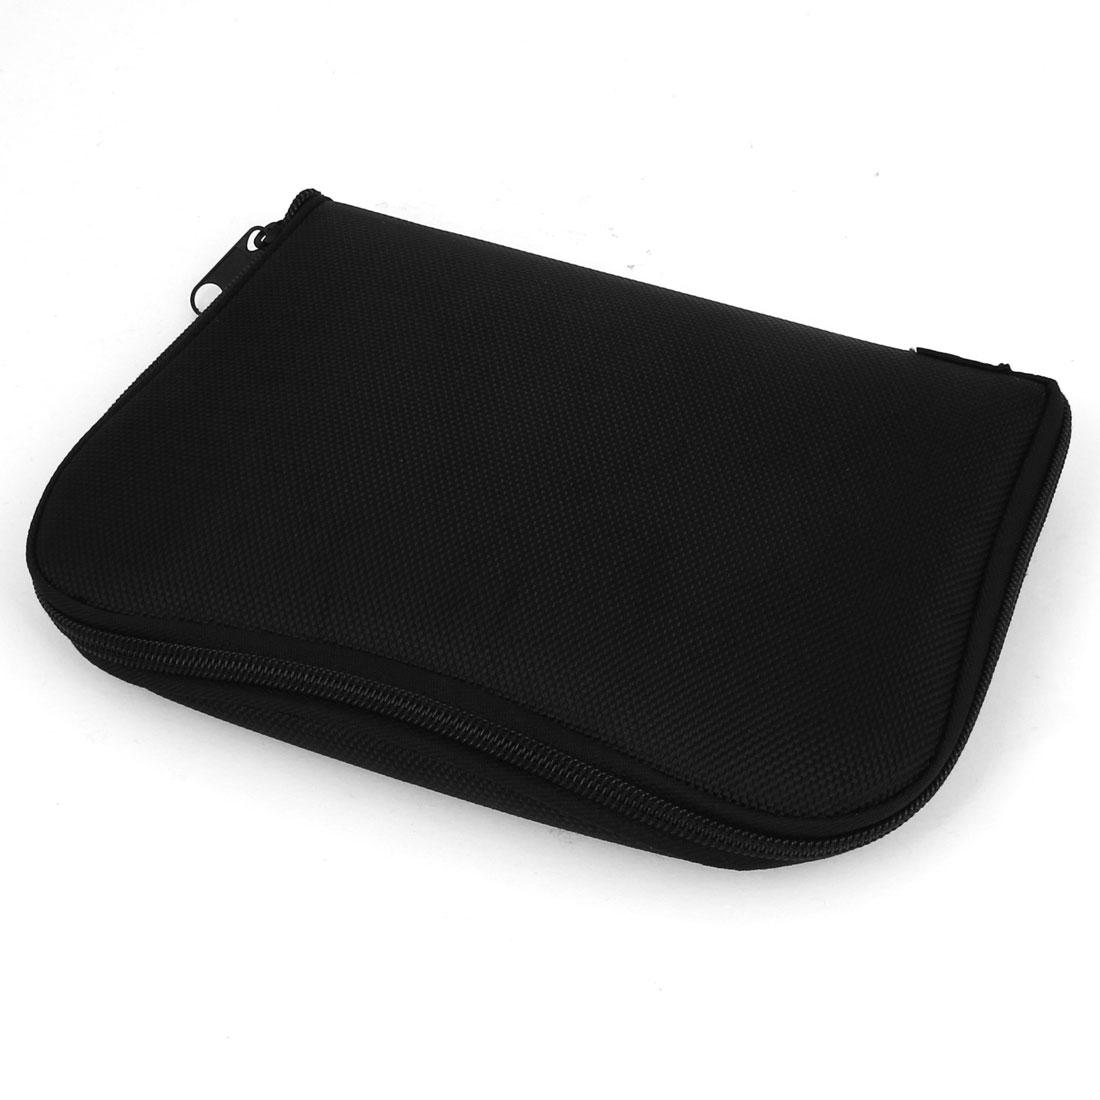 Zipper Closure Black Nylon 2 Compartment Foldable Tool Holder Bag